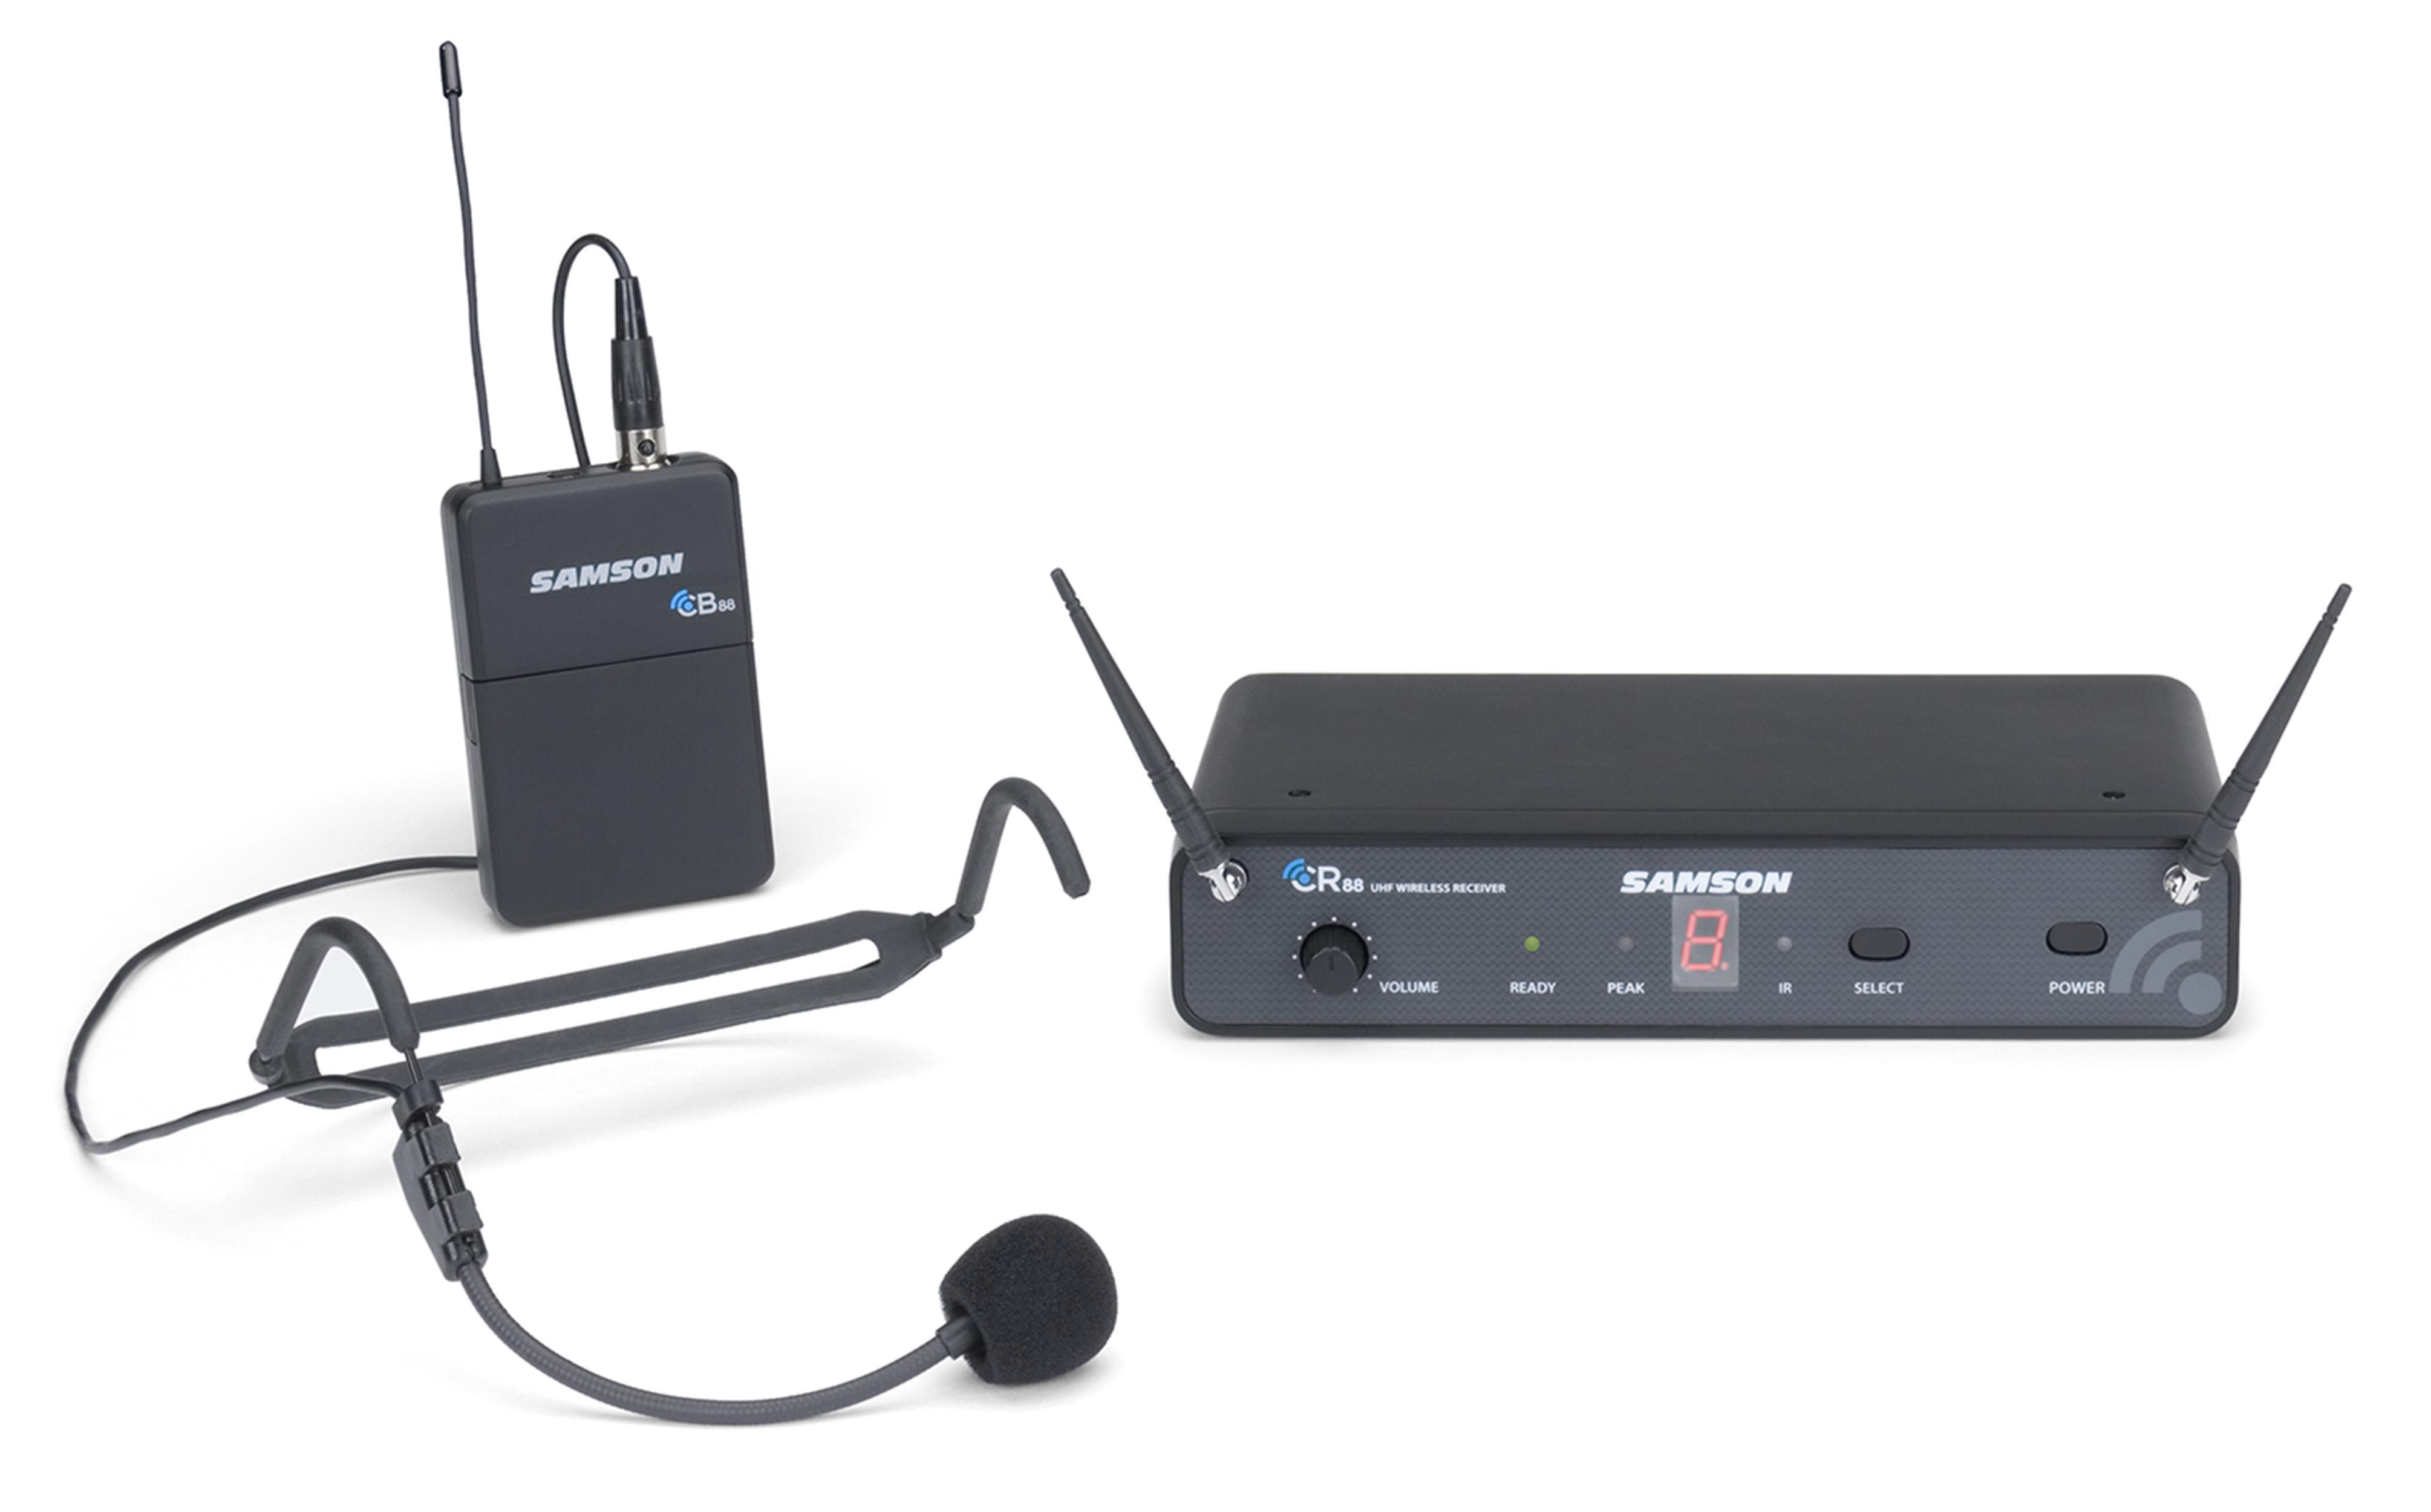 SAMSON-Concert-88-Headset-16-Channel-Wireless-System-HS5-HEADSET-ARCHETTO-sku-21226